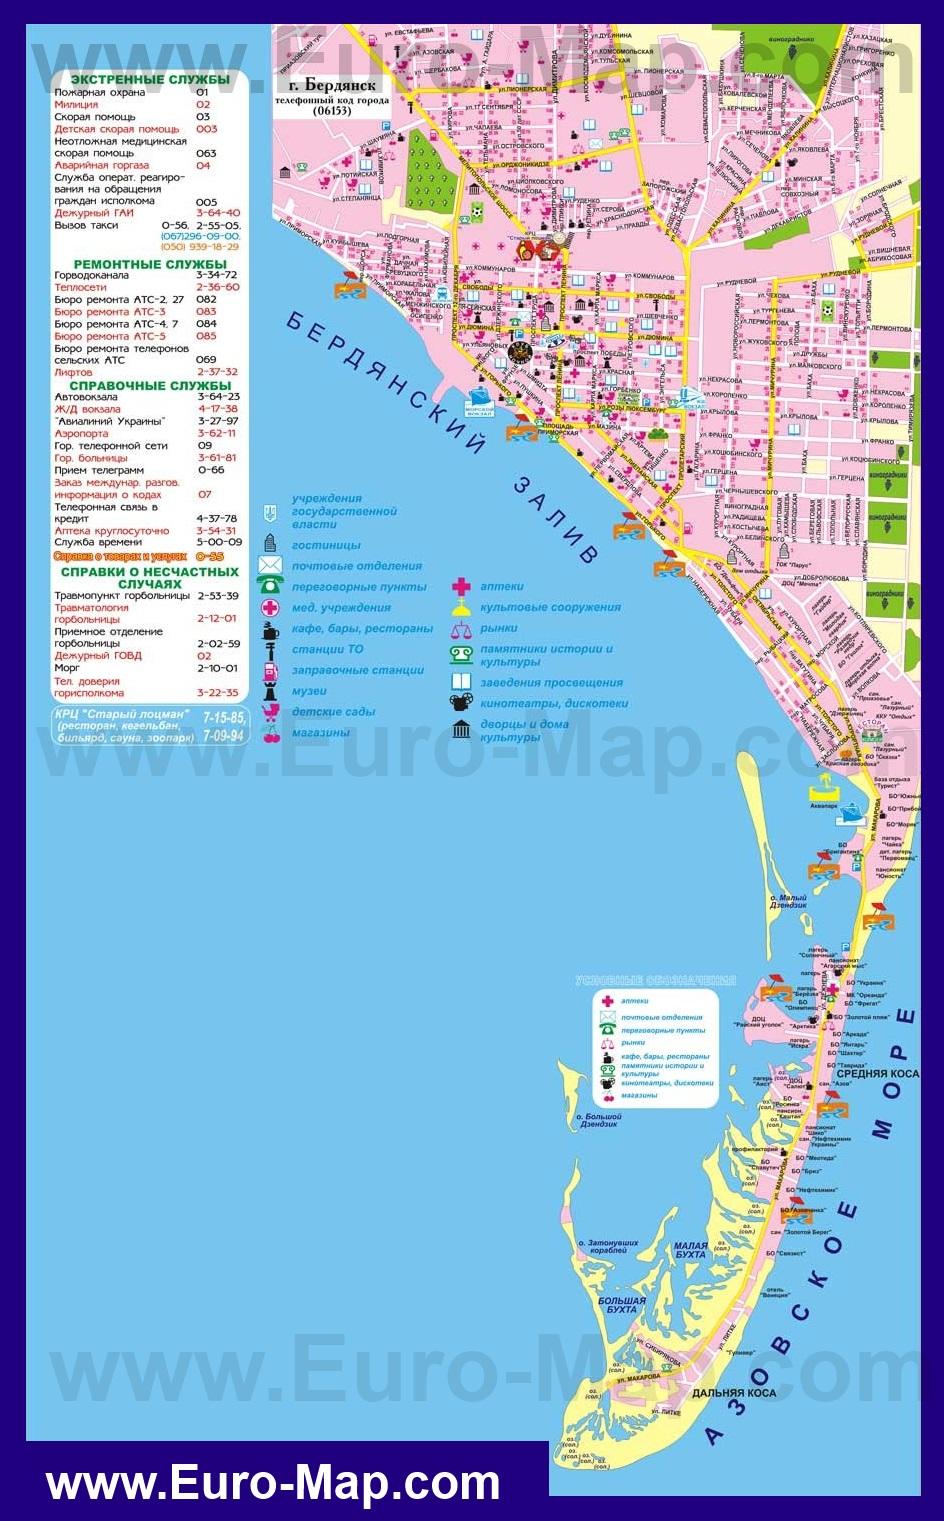 Карта Бердянской Косы С Улицами - rskuteplitel: http://rskuteplitel.weebly.com/blog/karta-berdyanskoj-kosi-s-ulicami